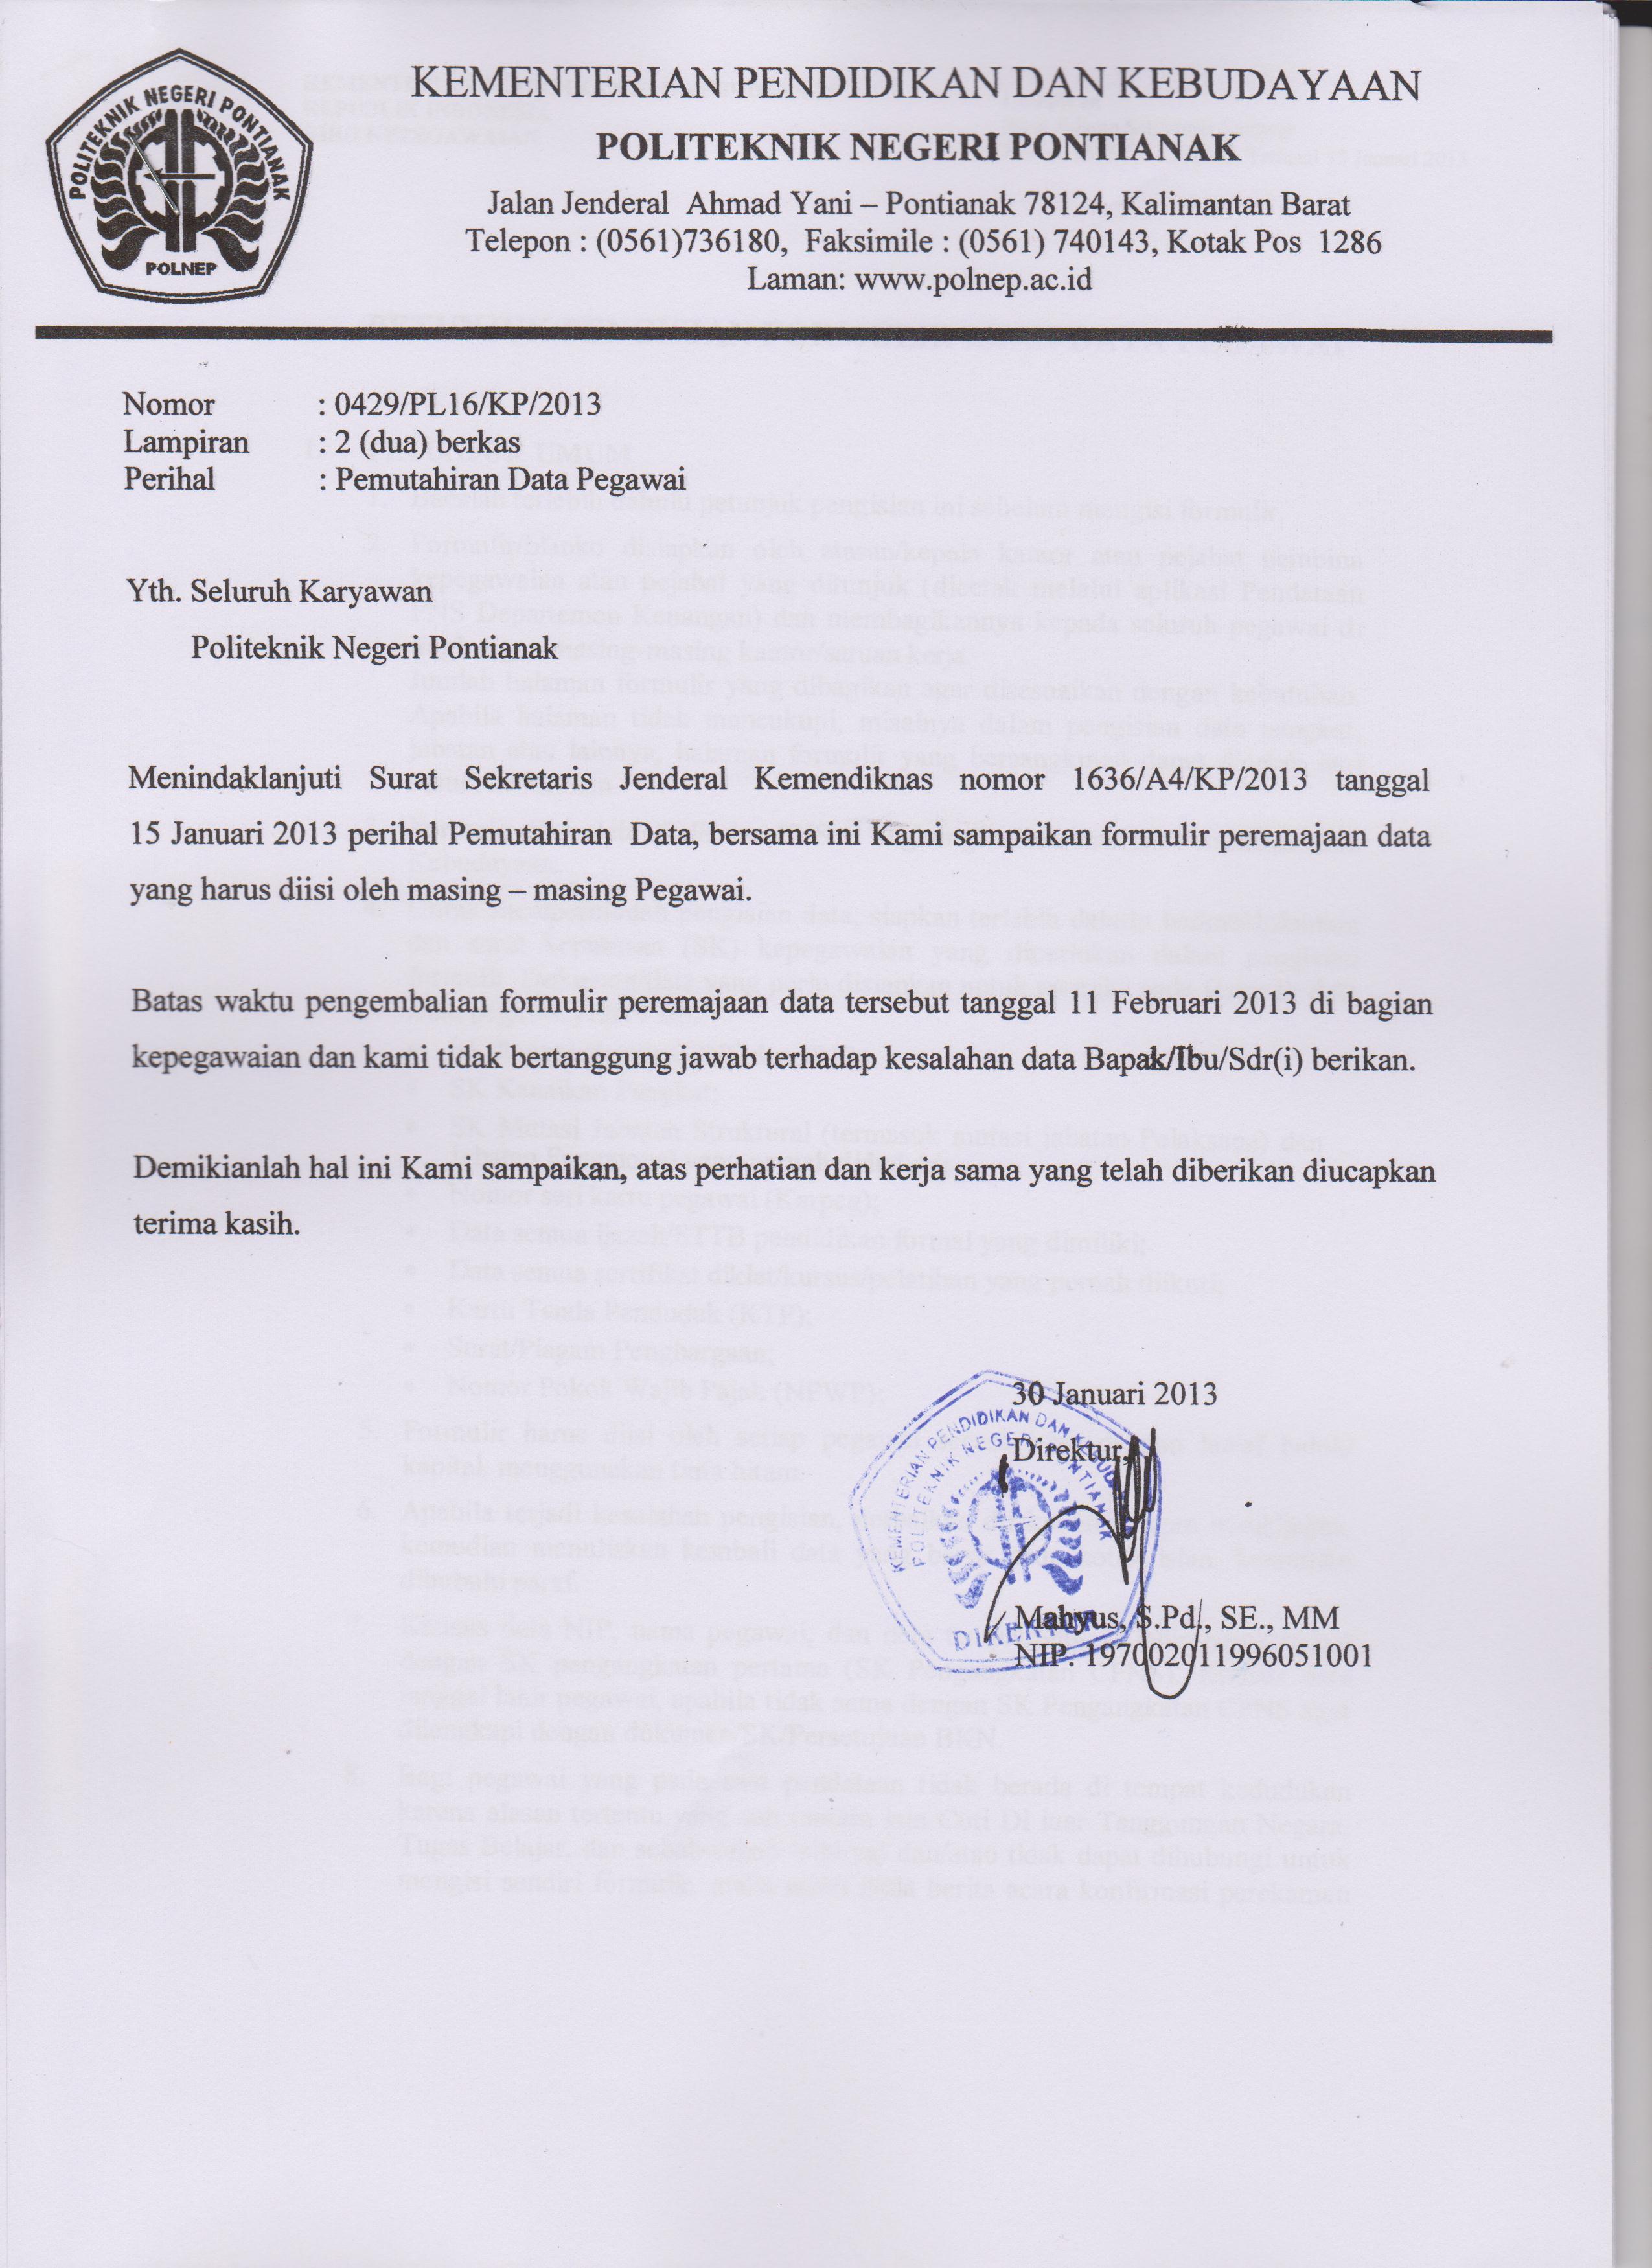 Contoh Surat Permohonan Naskah Drama Teks Drama Contoh